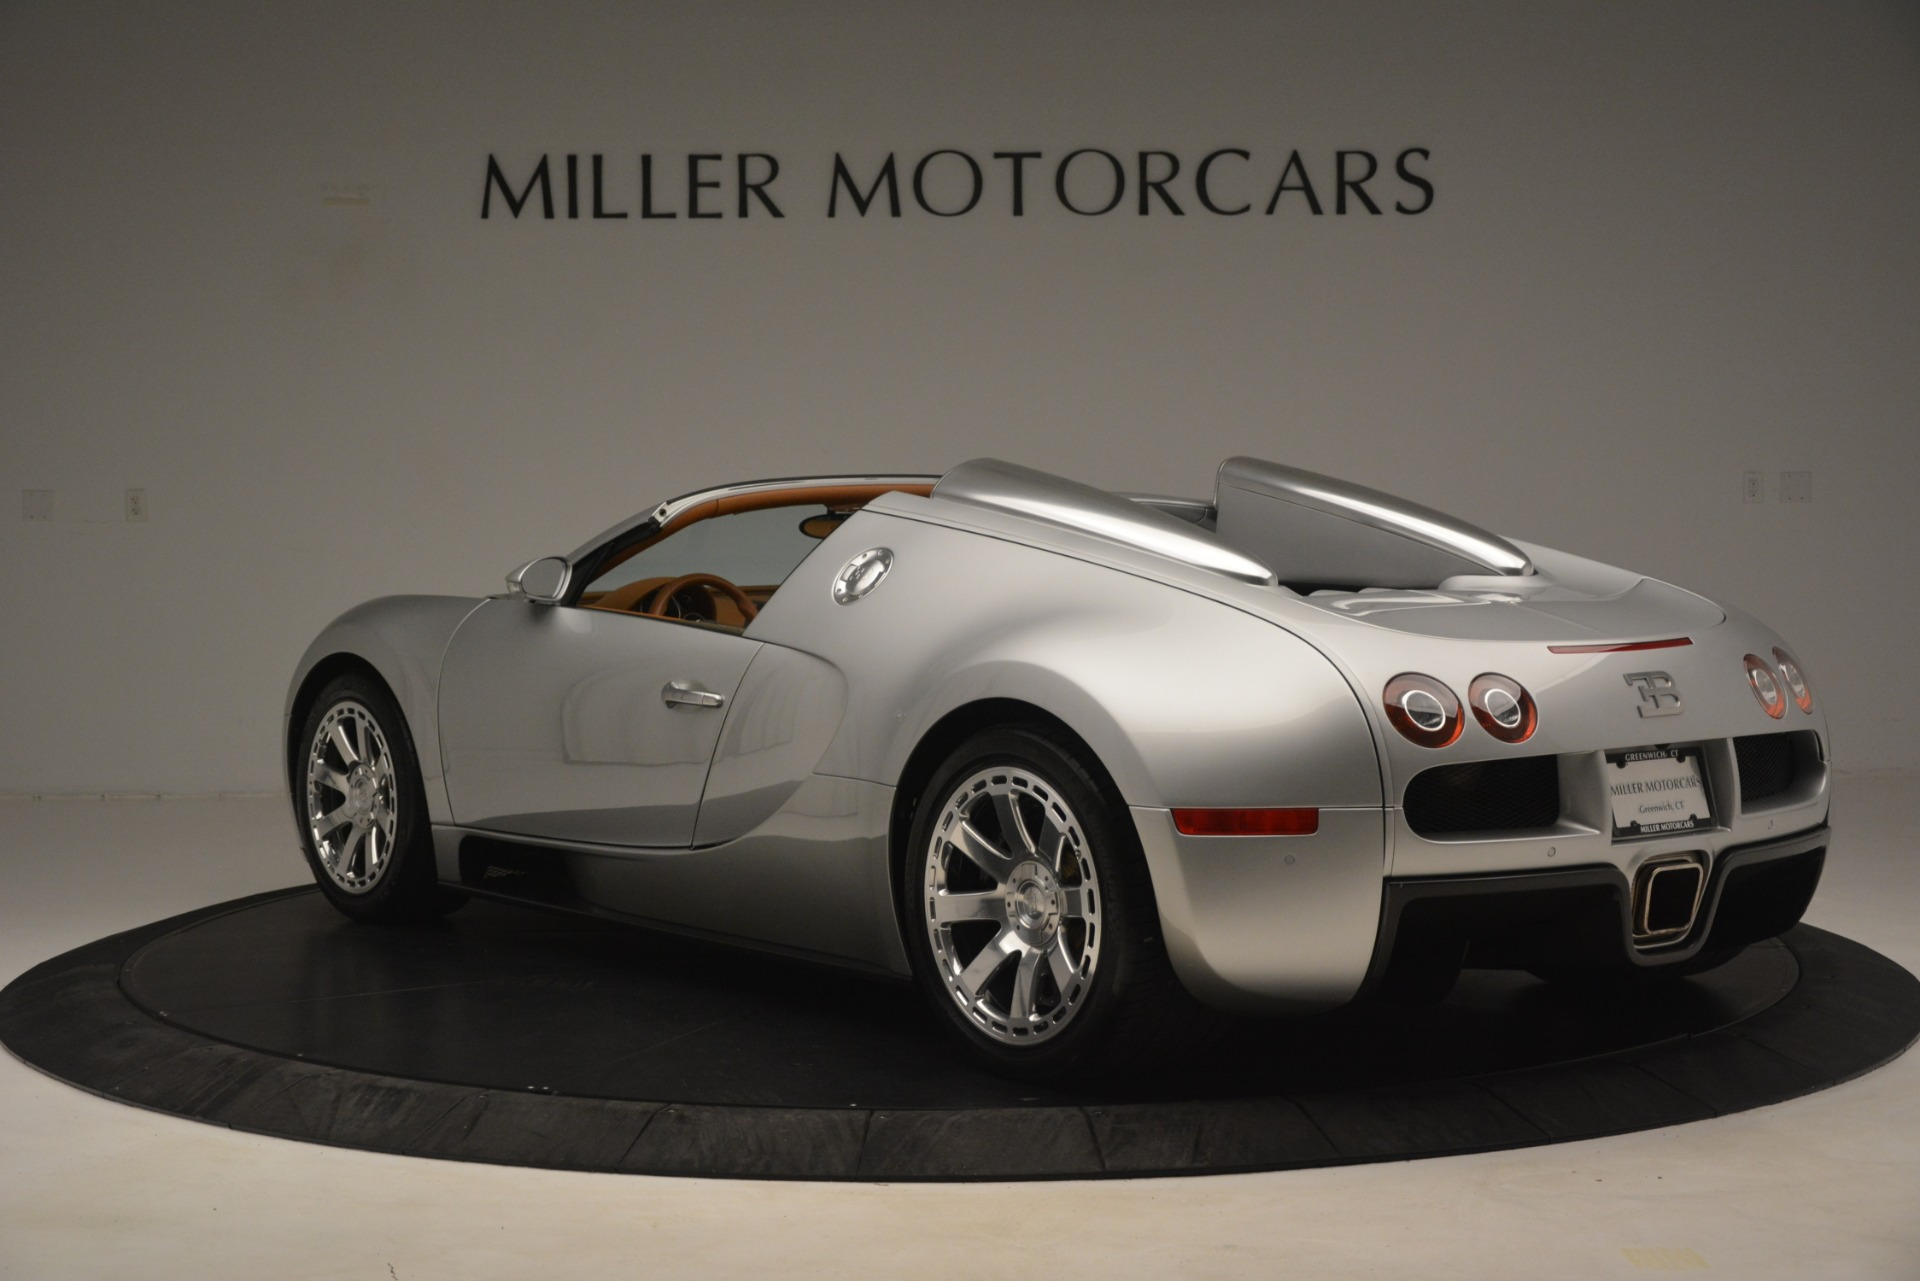 Used 2010 Bugatti Veyron 16.4 Grand Sport For Sale In Greenwich, CT 3159_p6